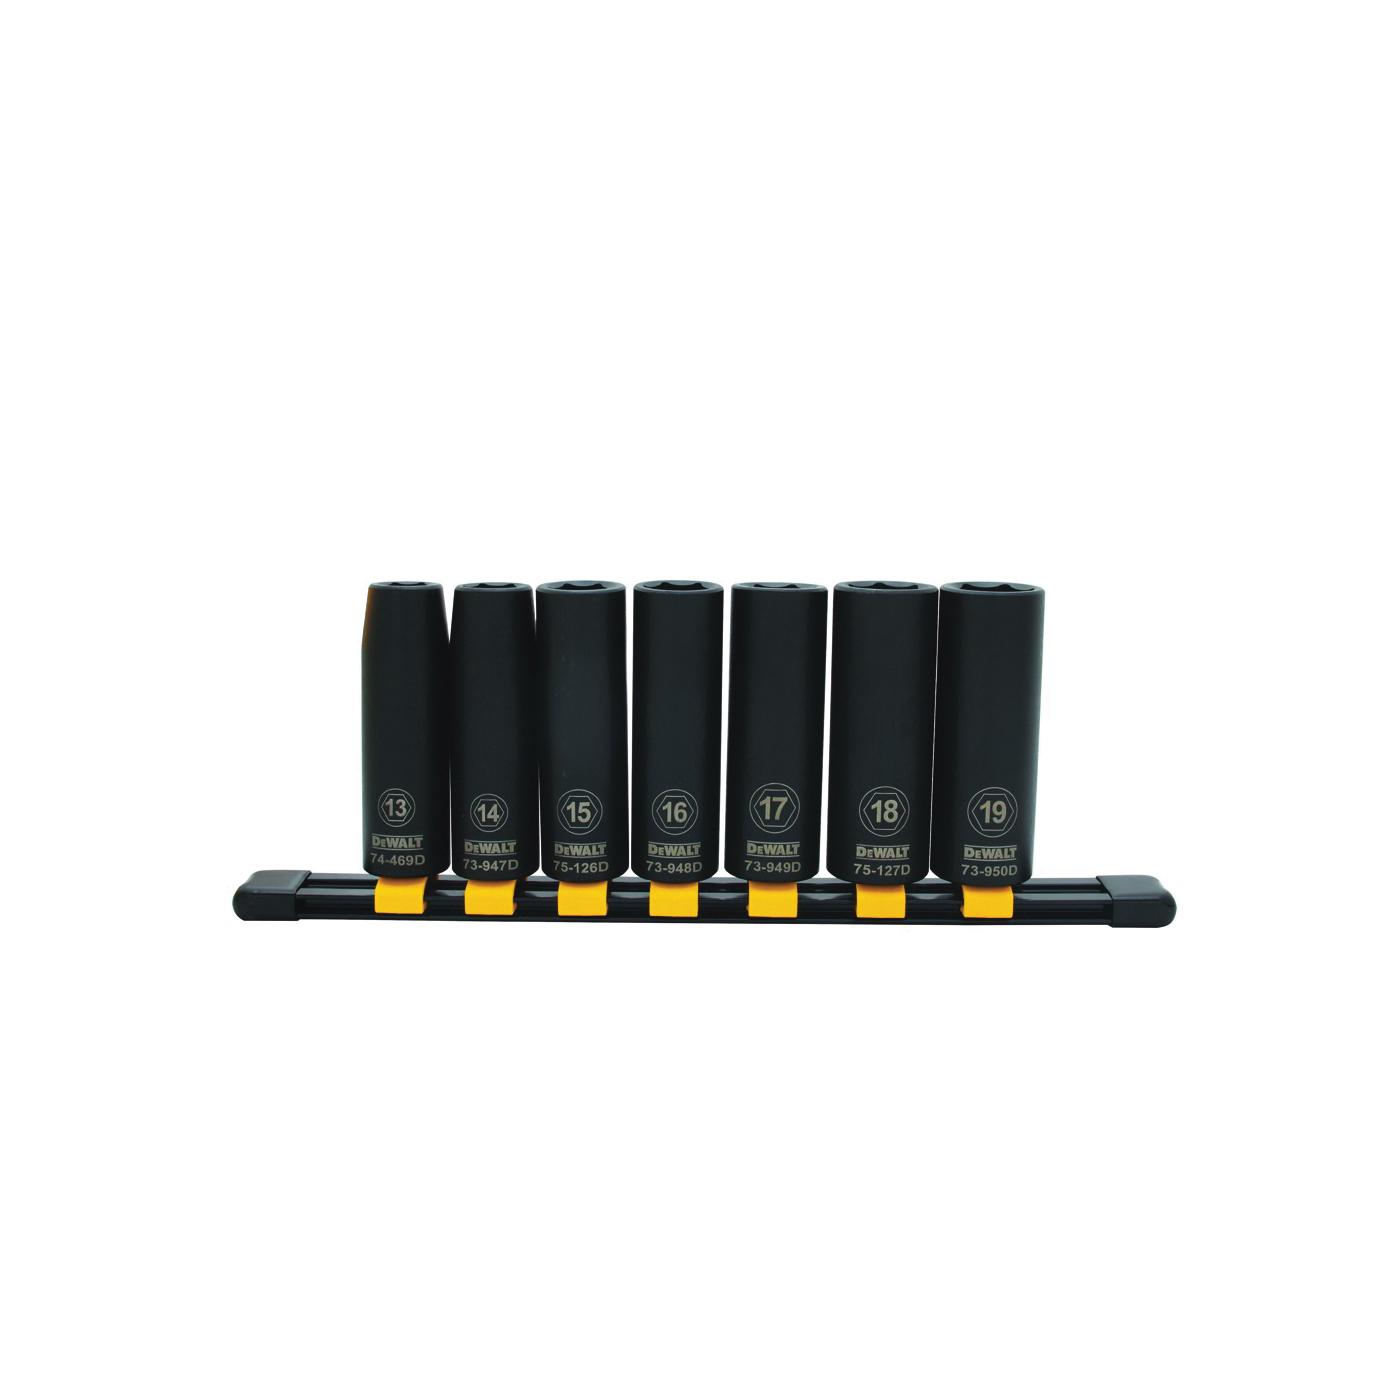 Picture of DeWALT DWMT74449OSP Socket Set, Specifications: 1/2 in Drive Size